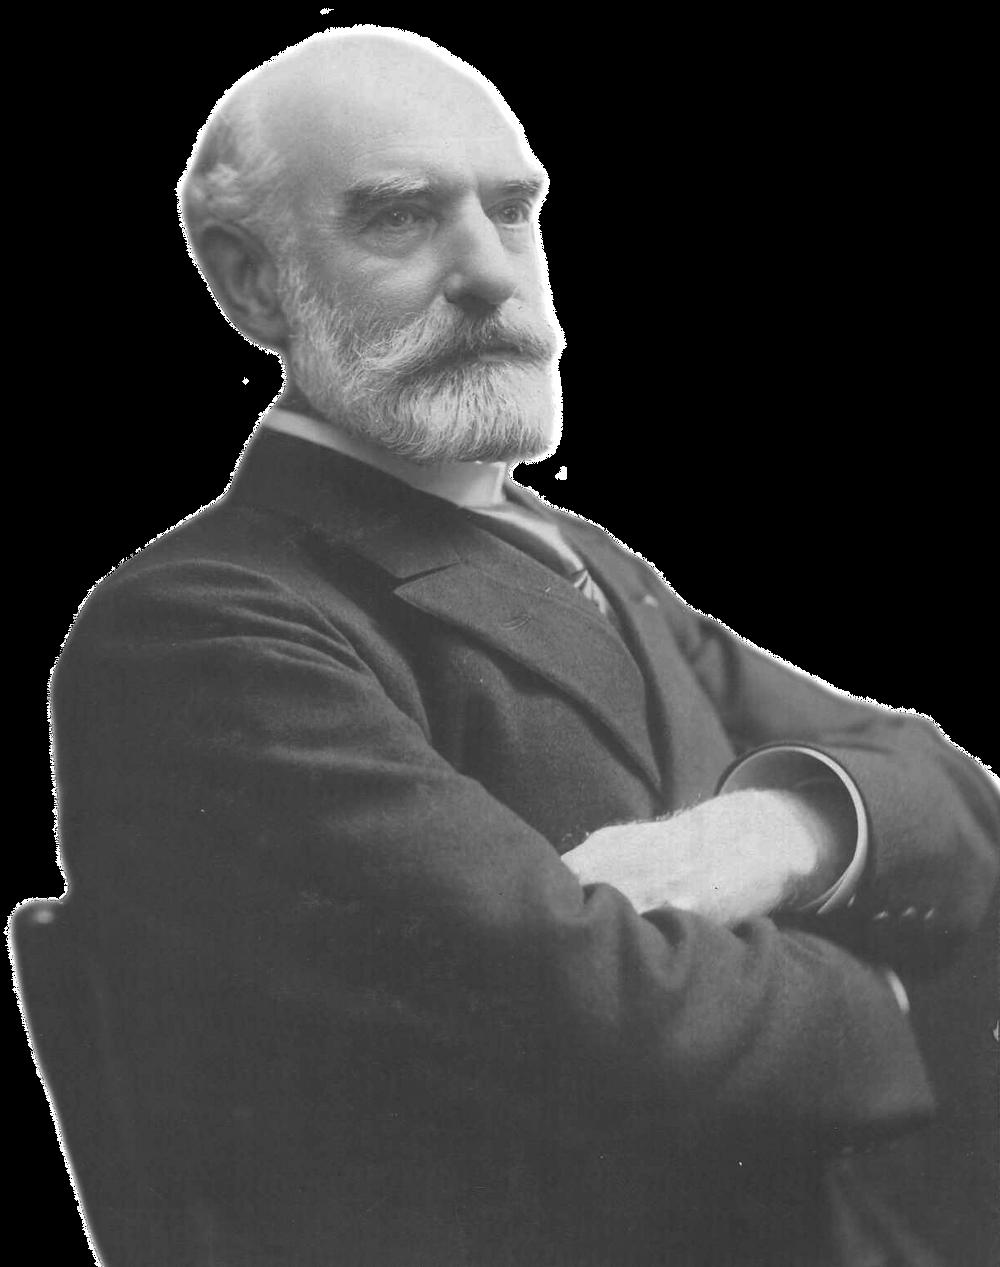 Dott. Charles Émile François-Franck